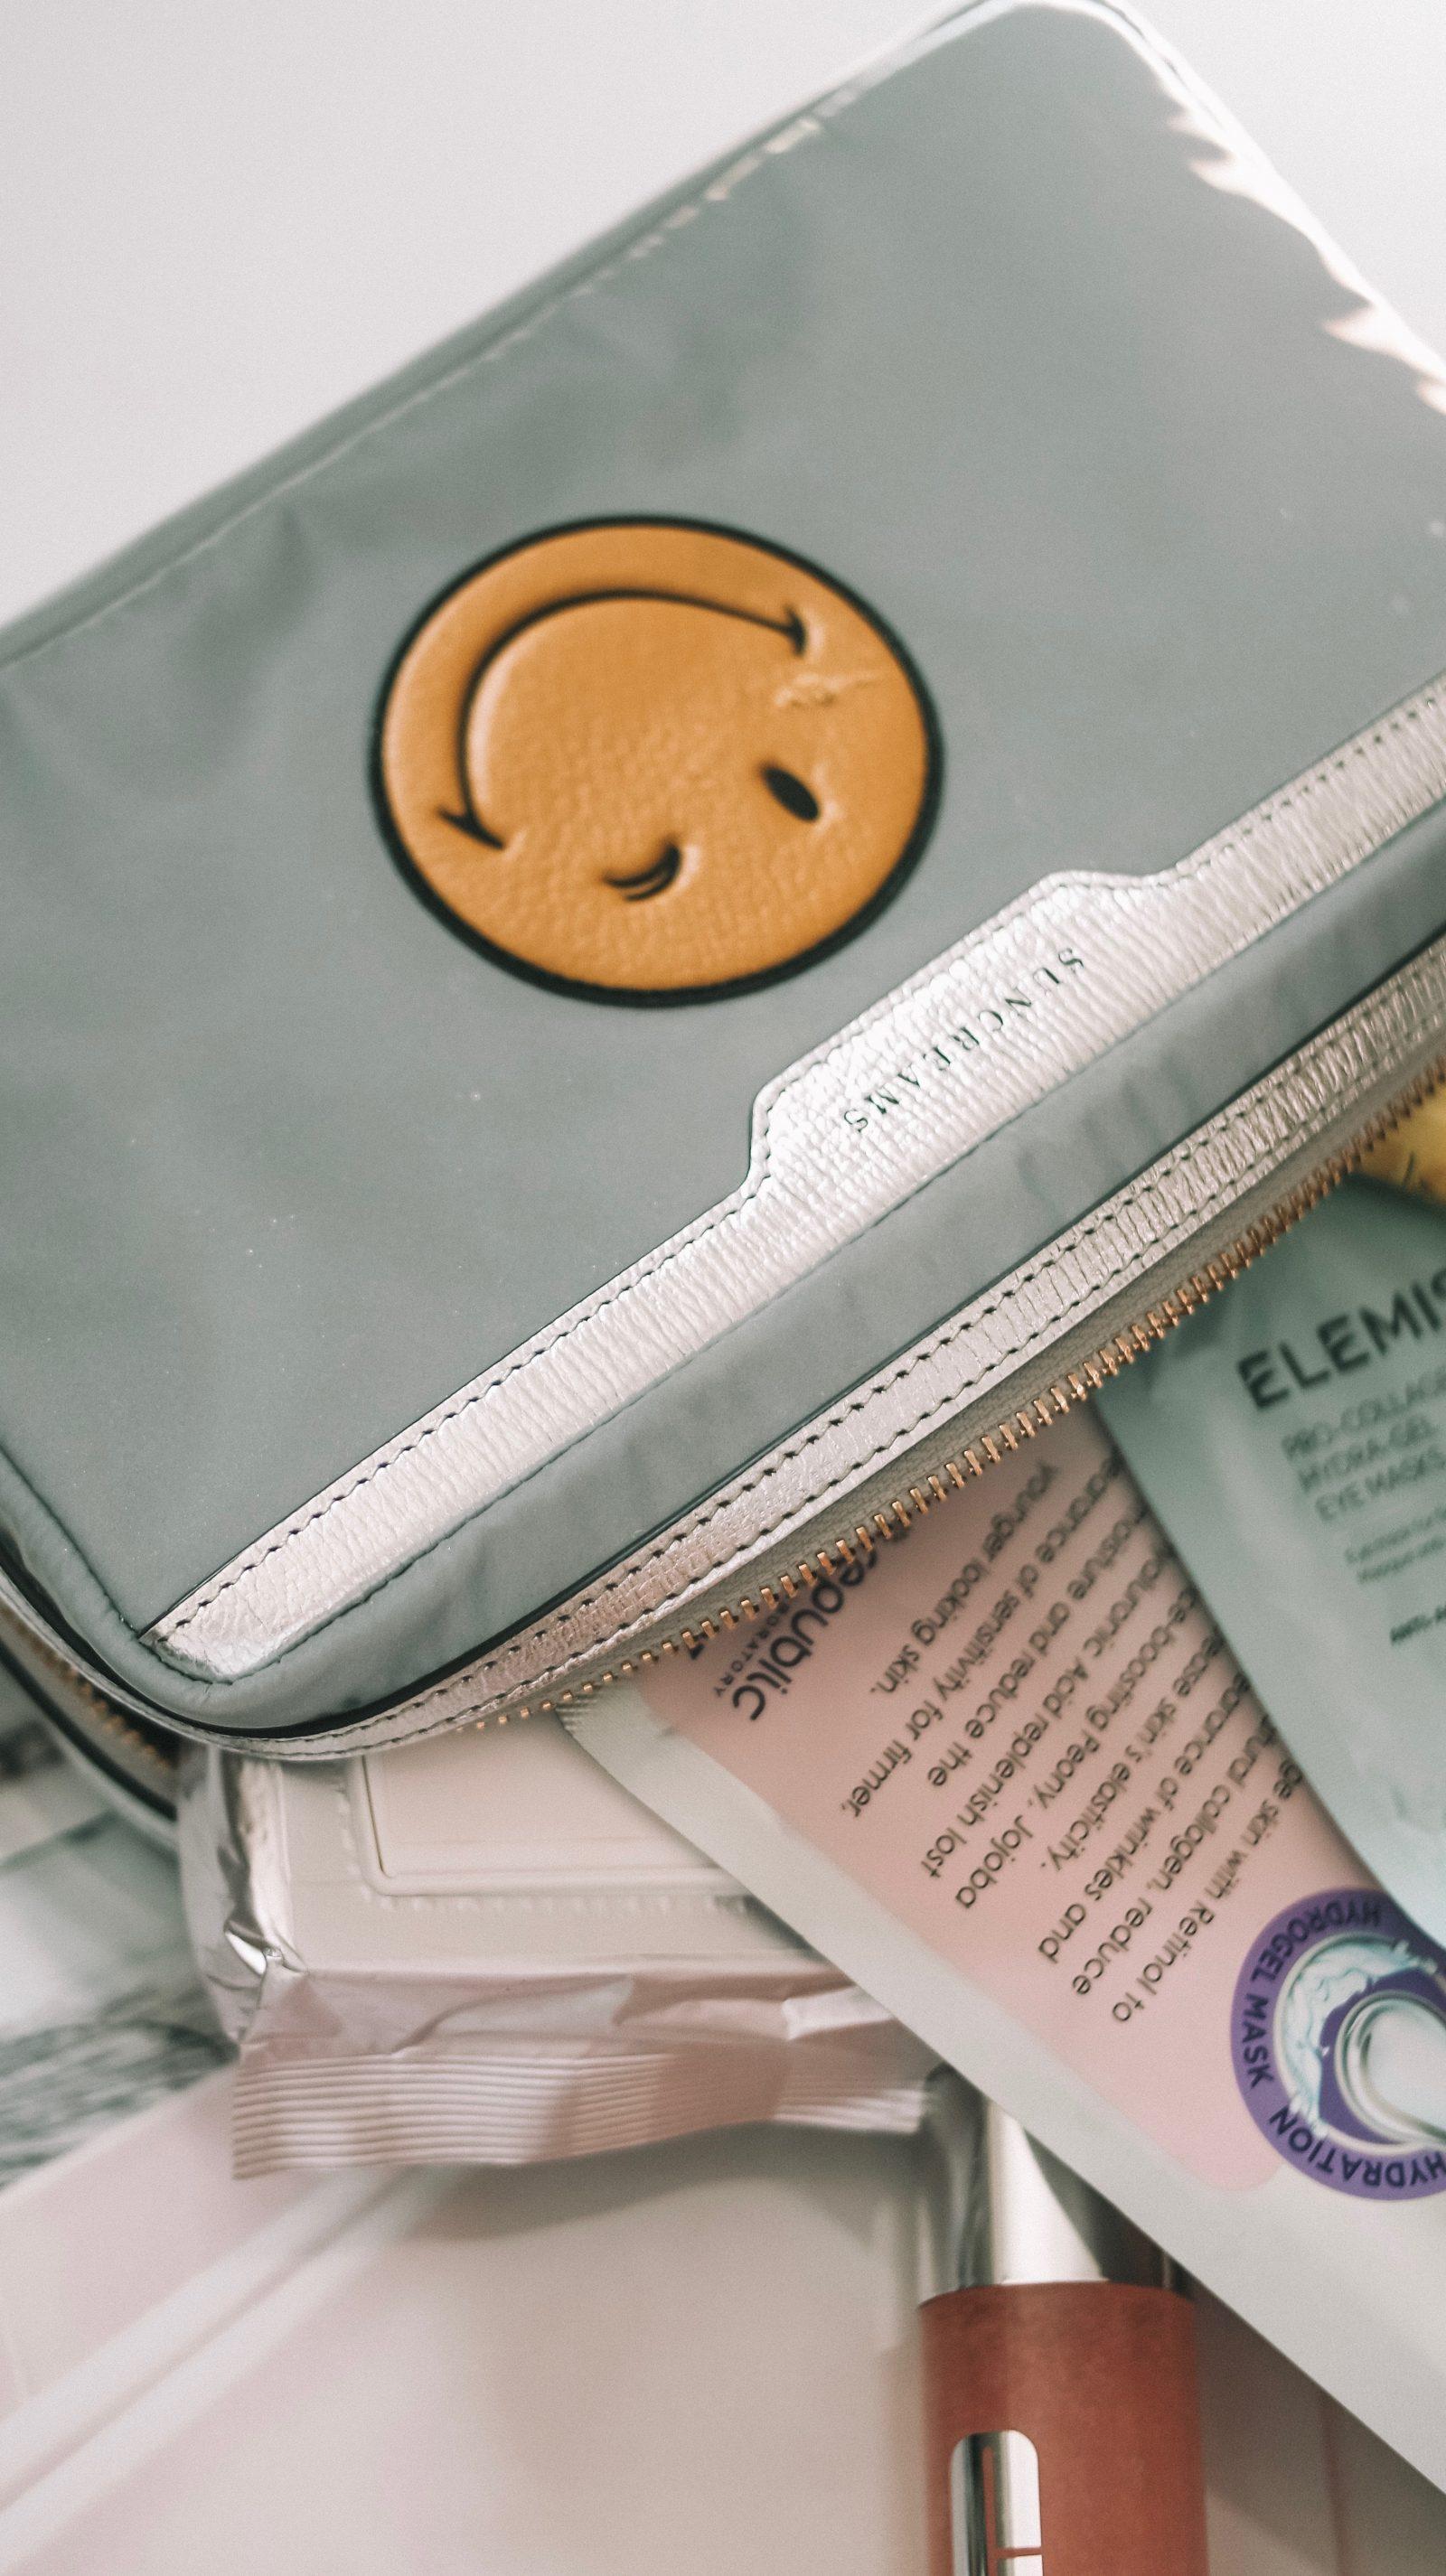 Inflight Beauty - Anya Hindmarch Bag